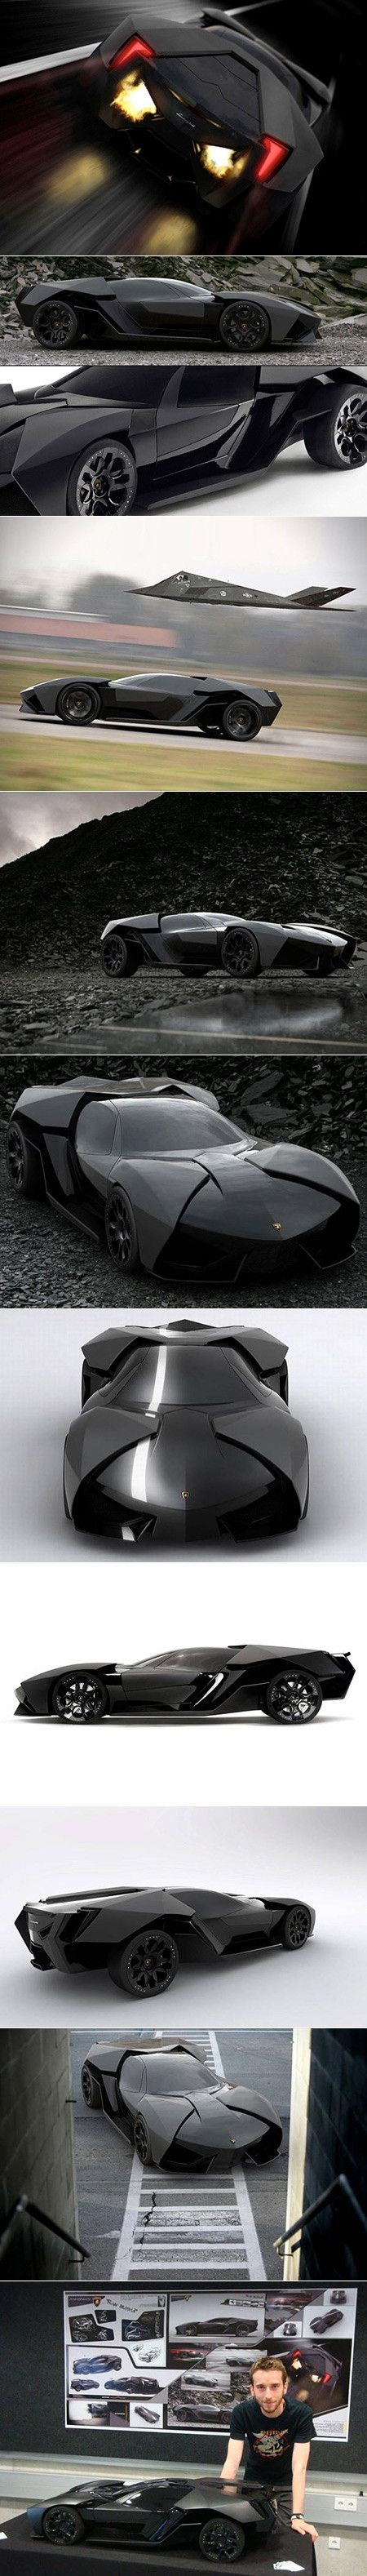 Another Look at the Batmobile-Inspired Lamborghini Ankonian - TechEBlog.